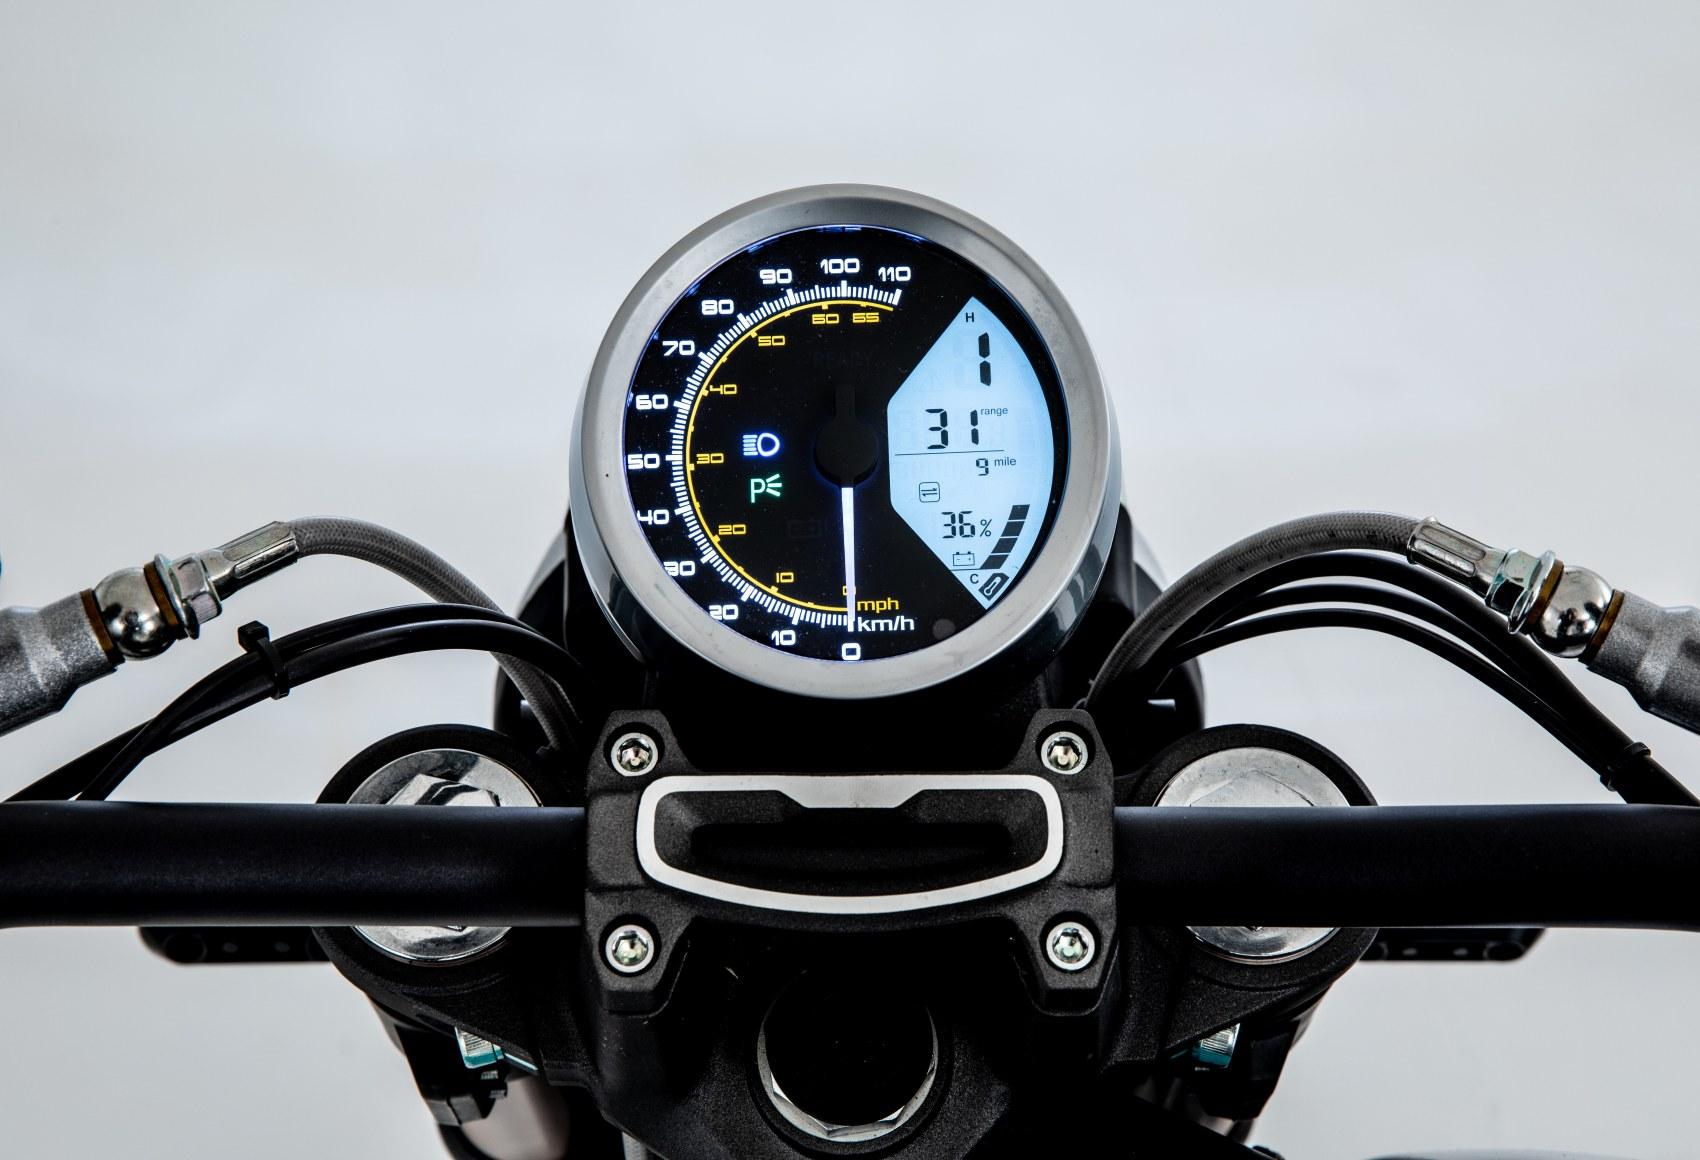 Super Soco TC Max electric motorcycle dash